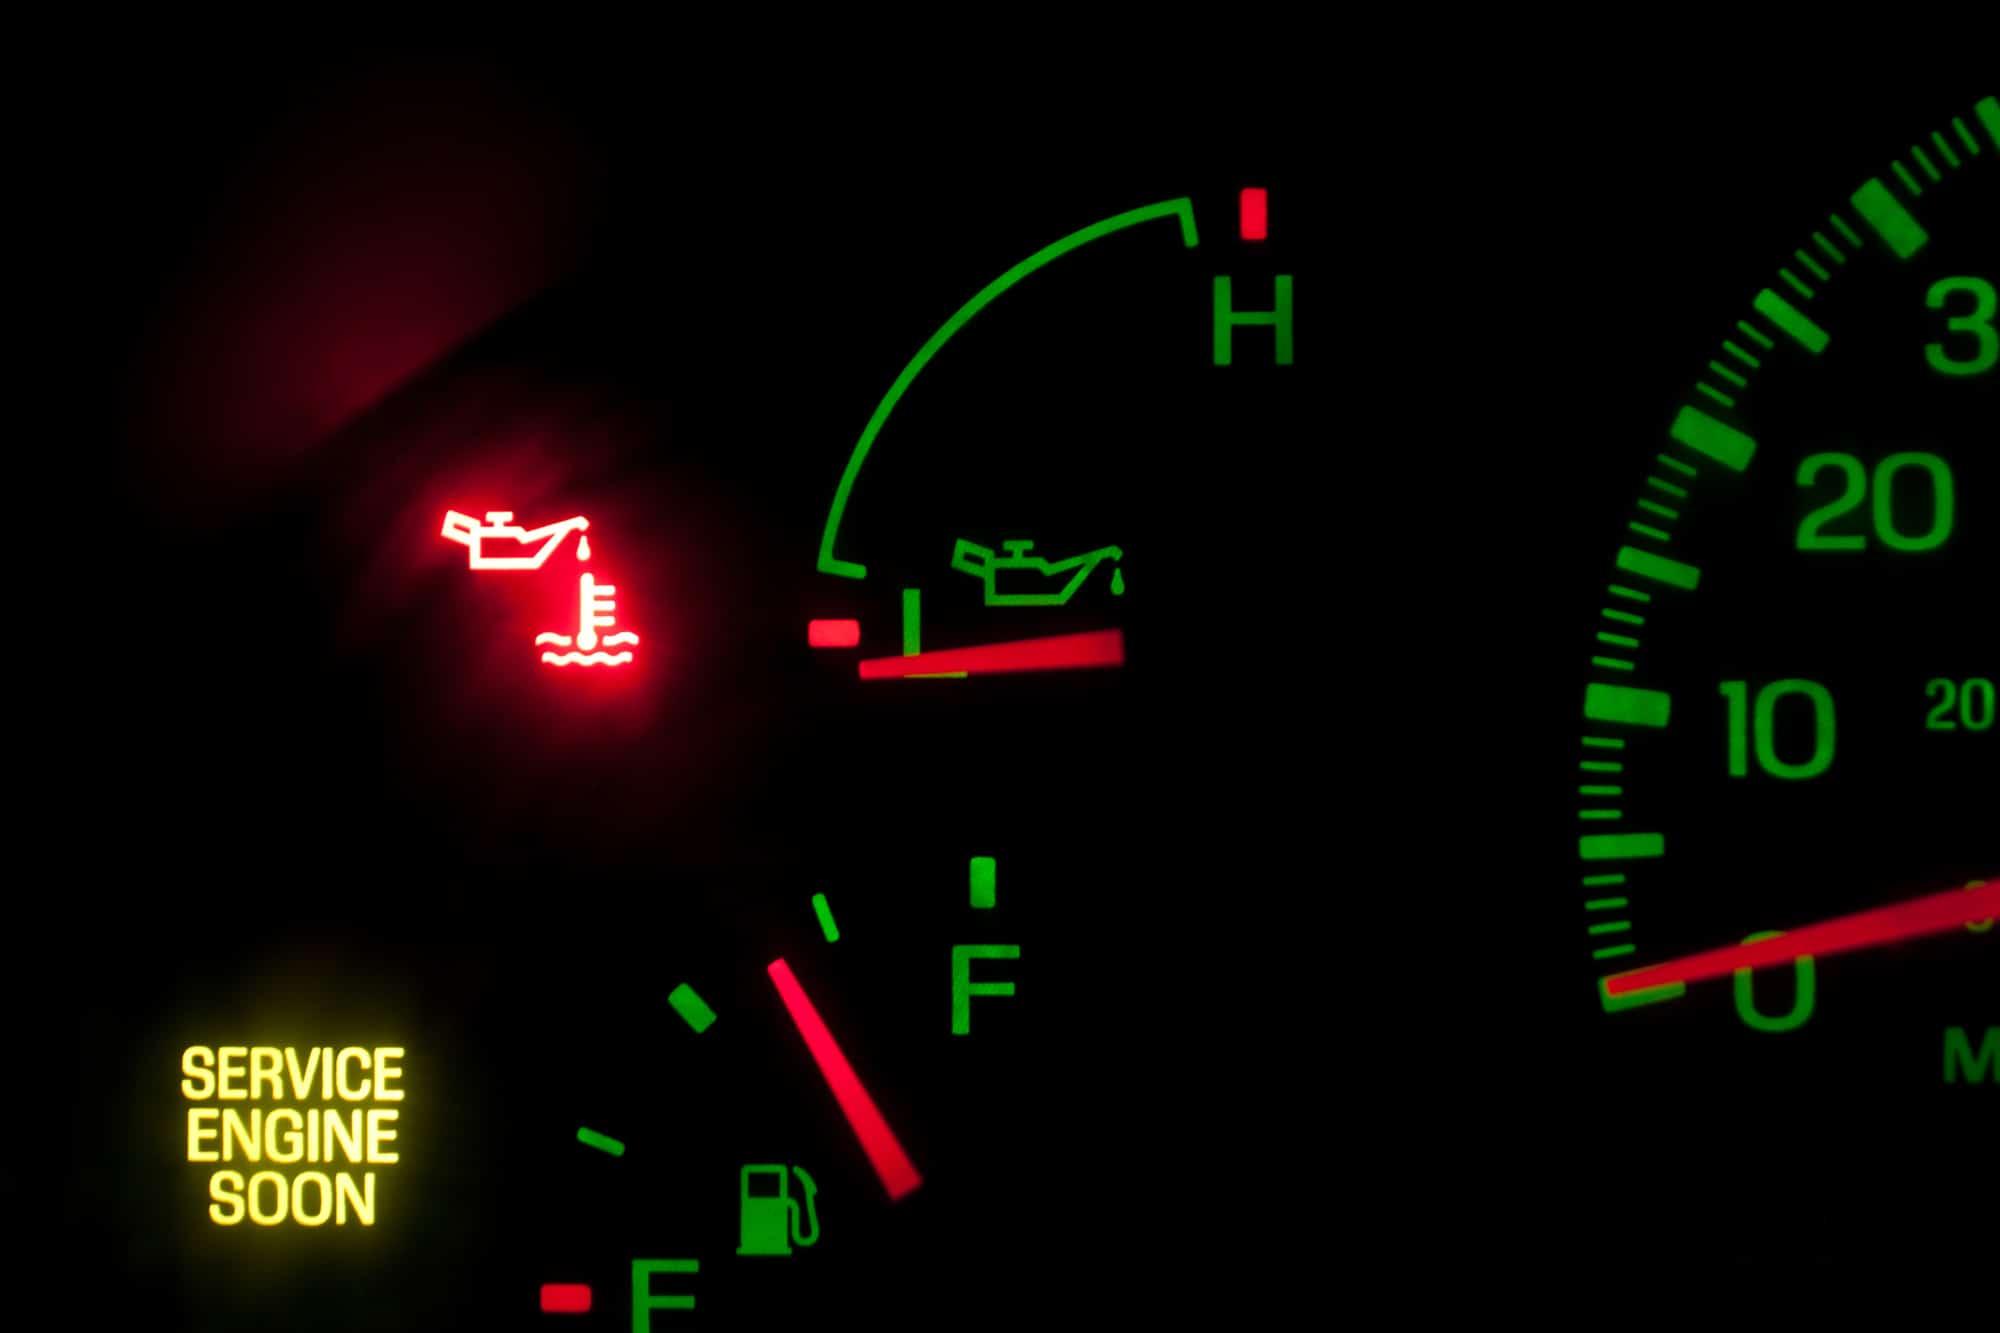 Service Engine oil pressure